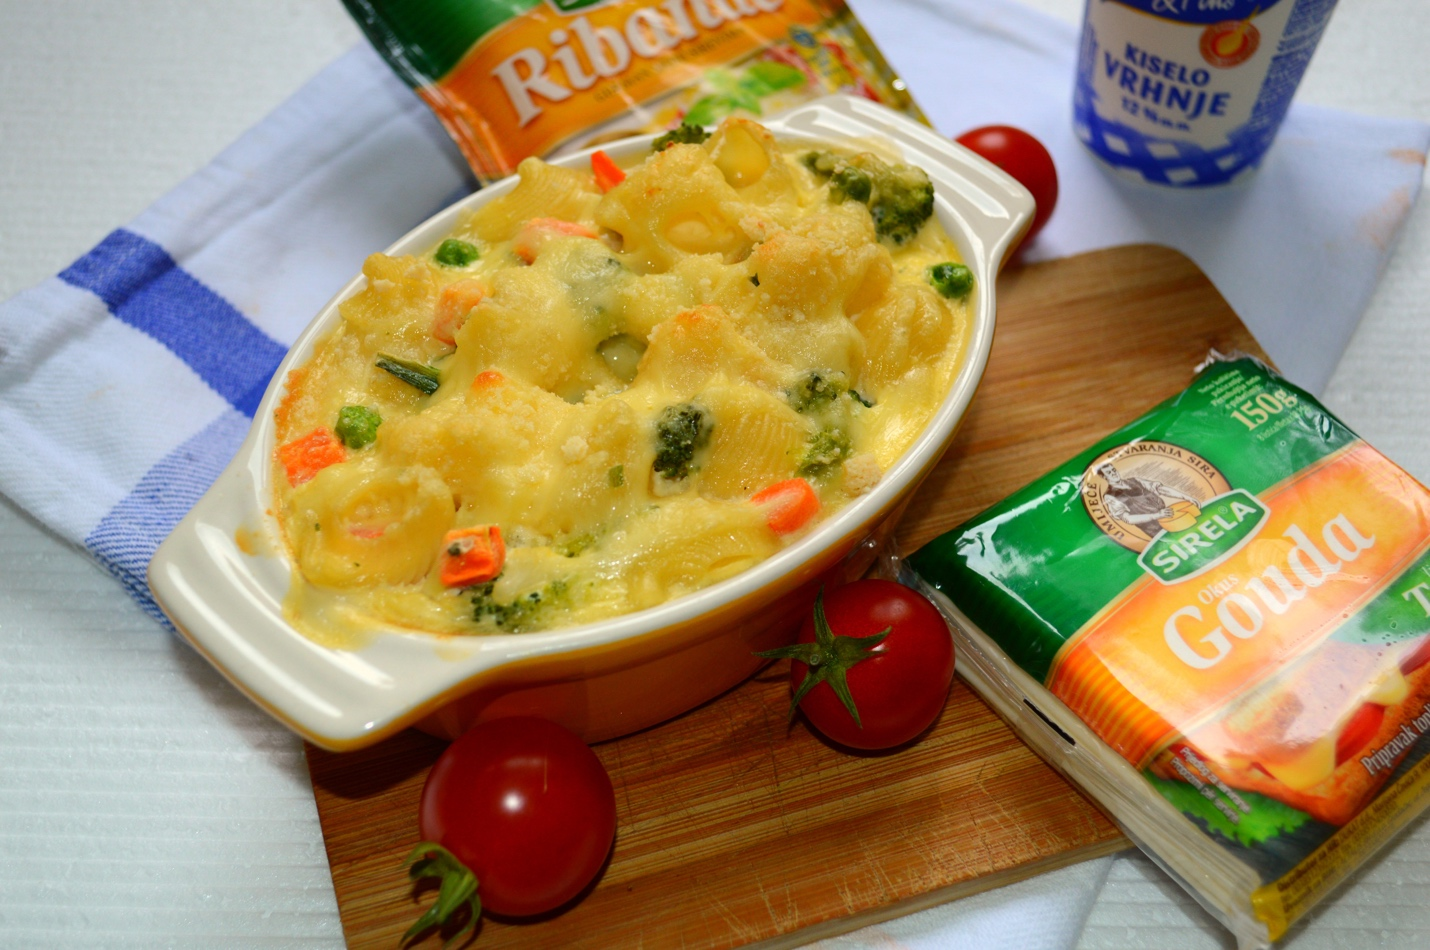 Studentski recepti: Zapečeni makaroni s povrćem